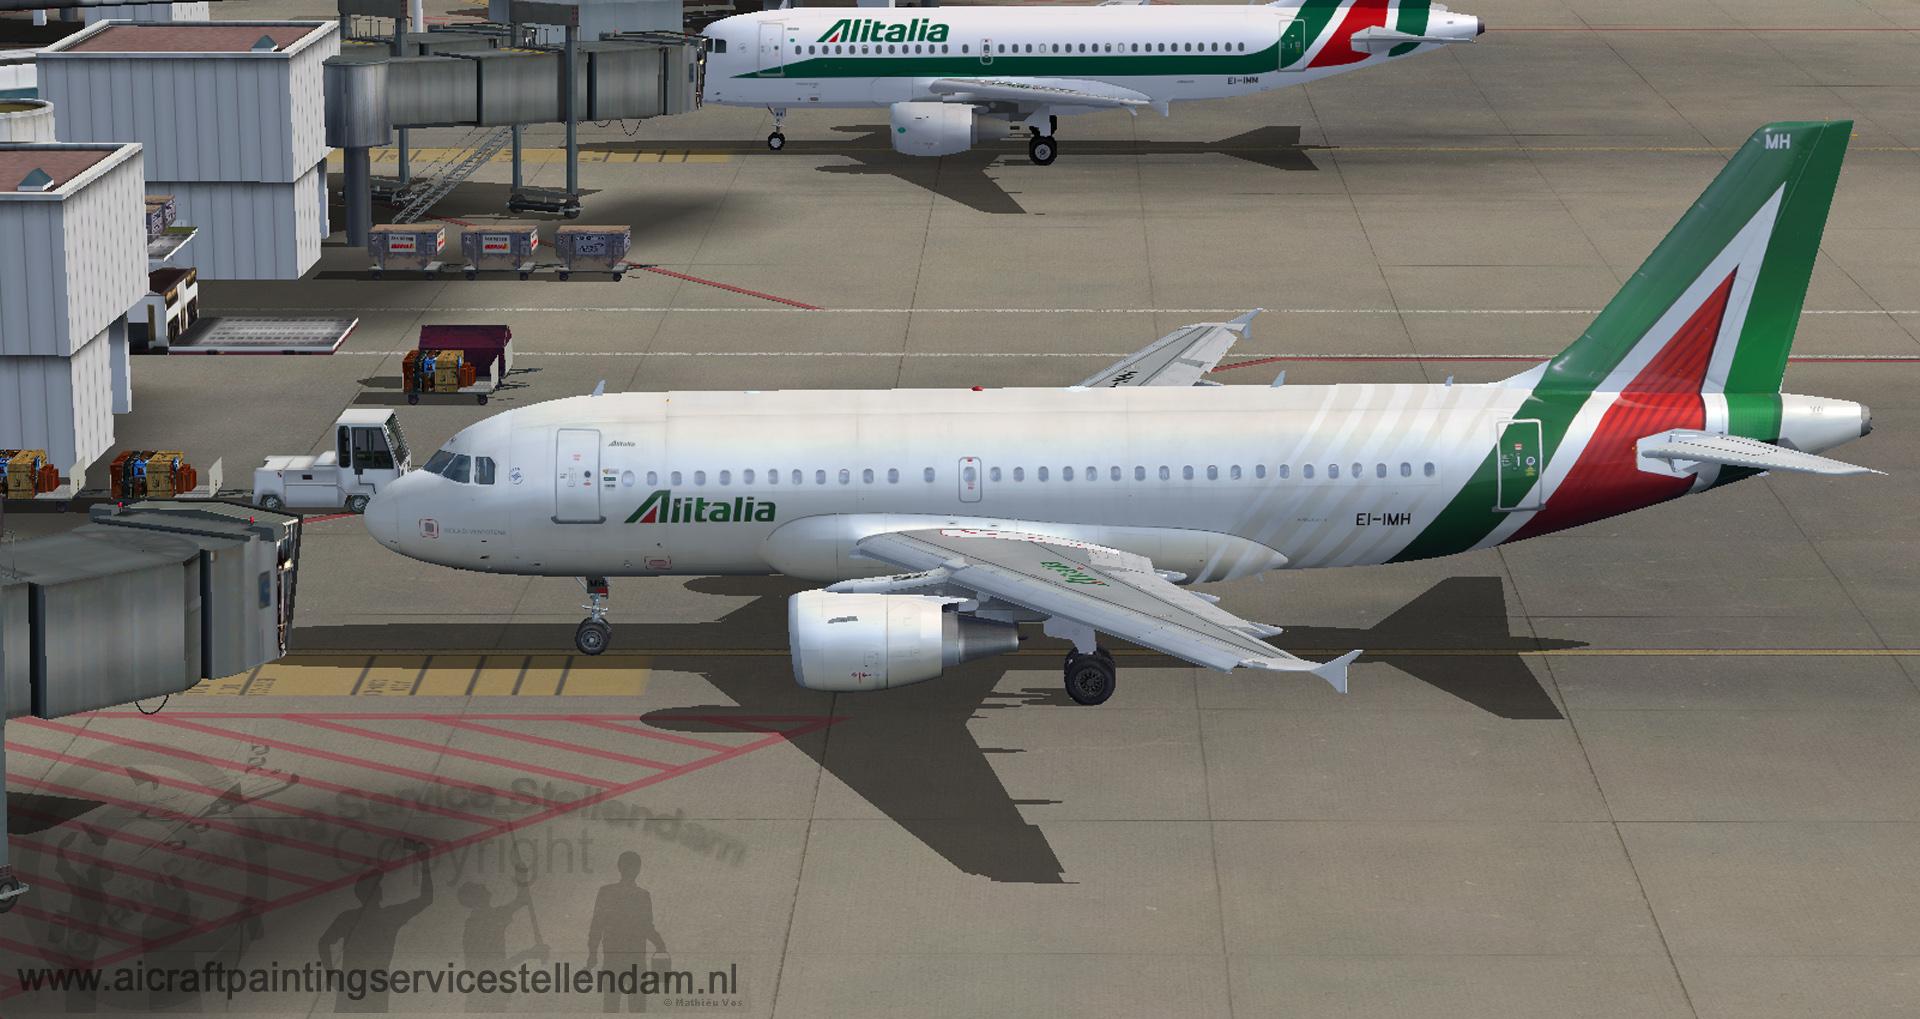 ProjectAirbusA319-112Alitalia_nc_EI-IMH